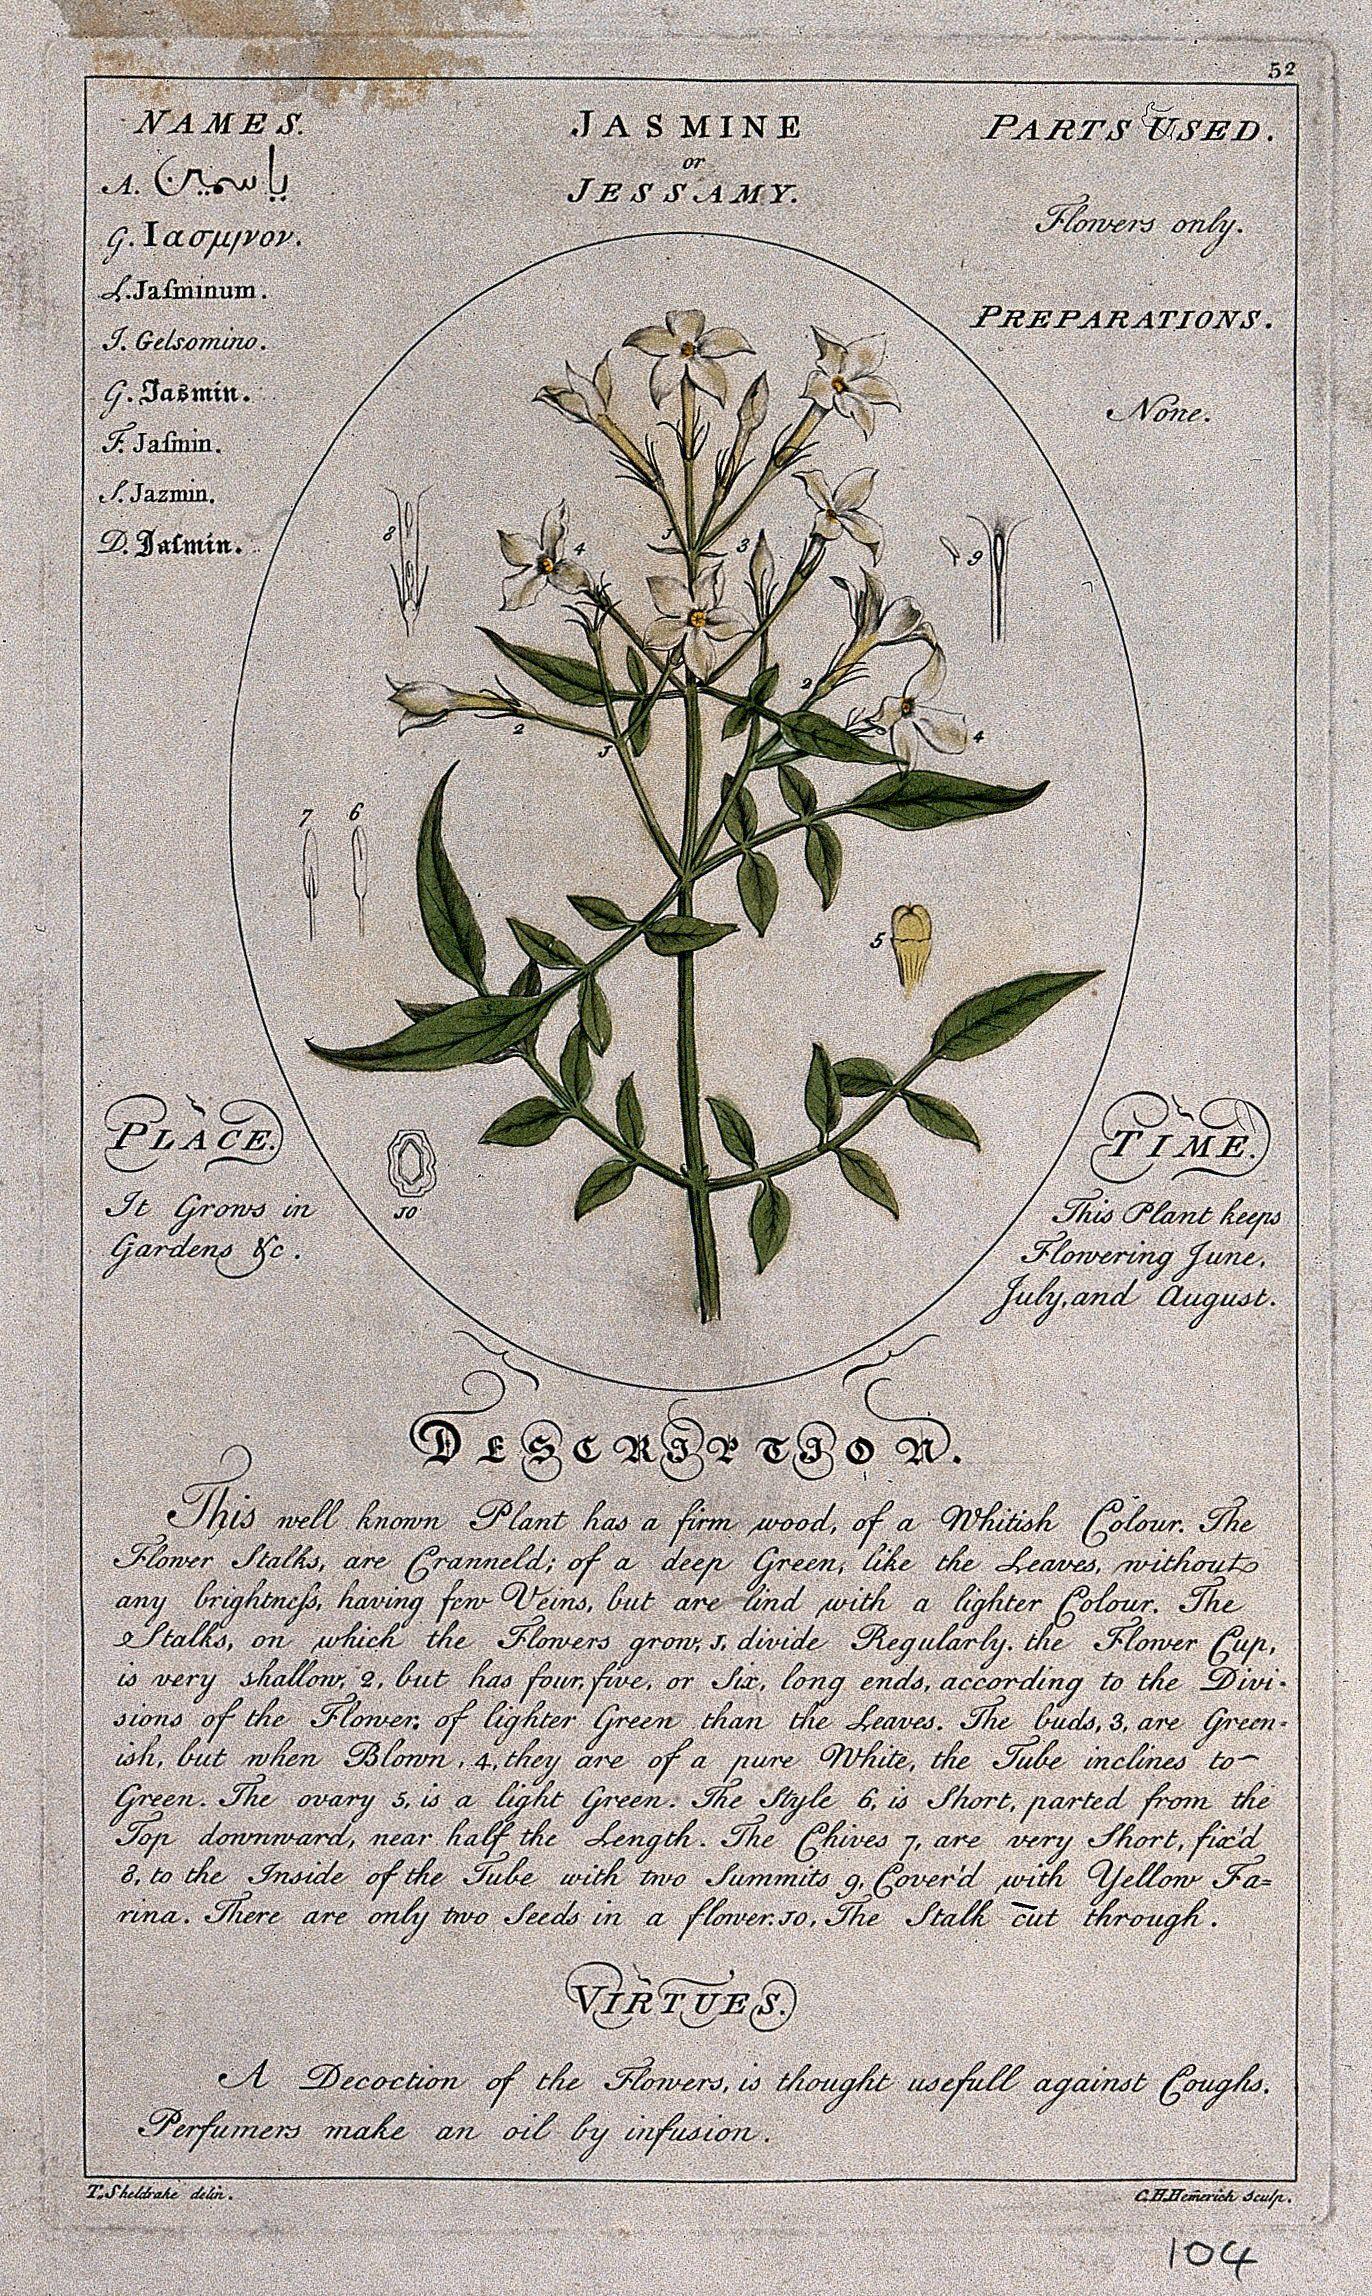 Jasmine jasminum officinale l flowering stem with floral download izmirmasajfo